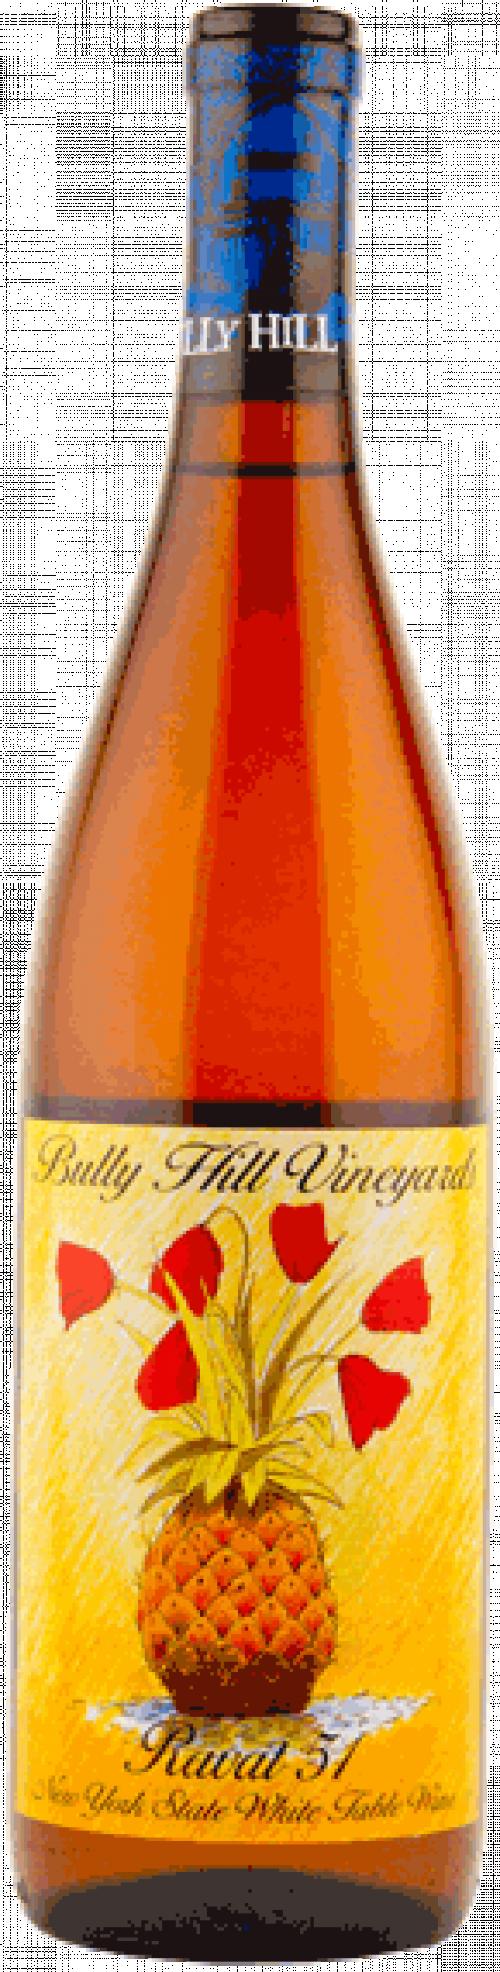 Bully Hill Ravat 51 Blanc 750Ml